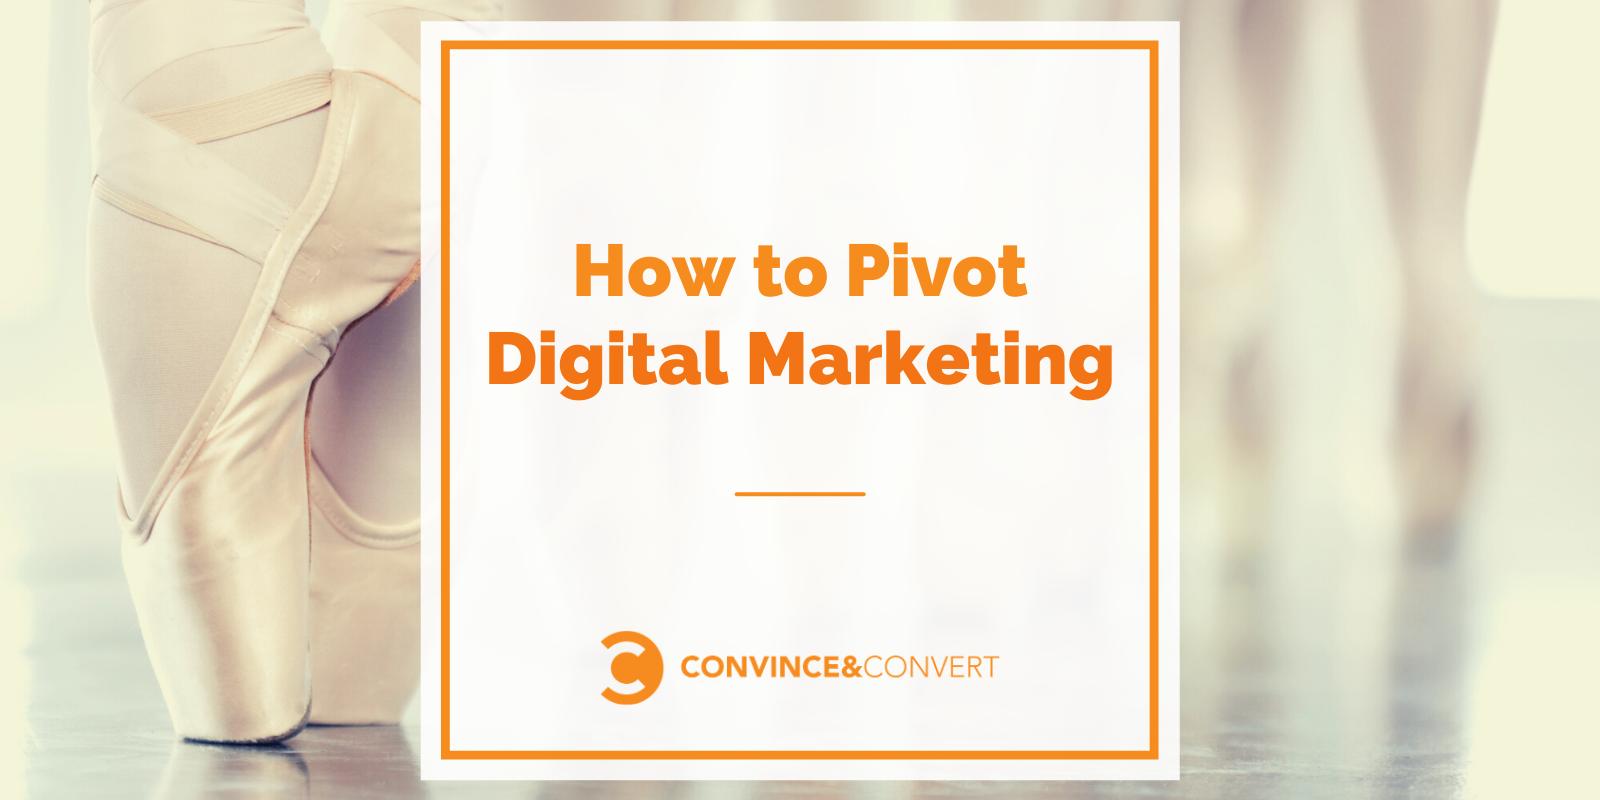 Pivot Digital Advertising and marketing – Persuade & Convert